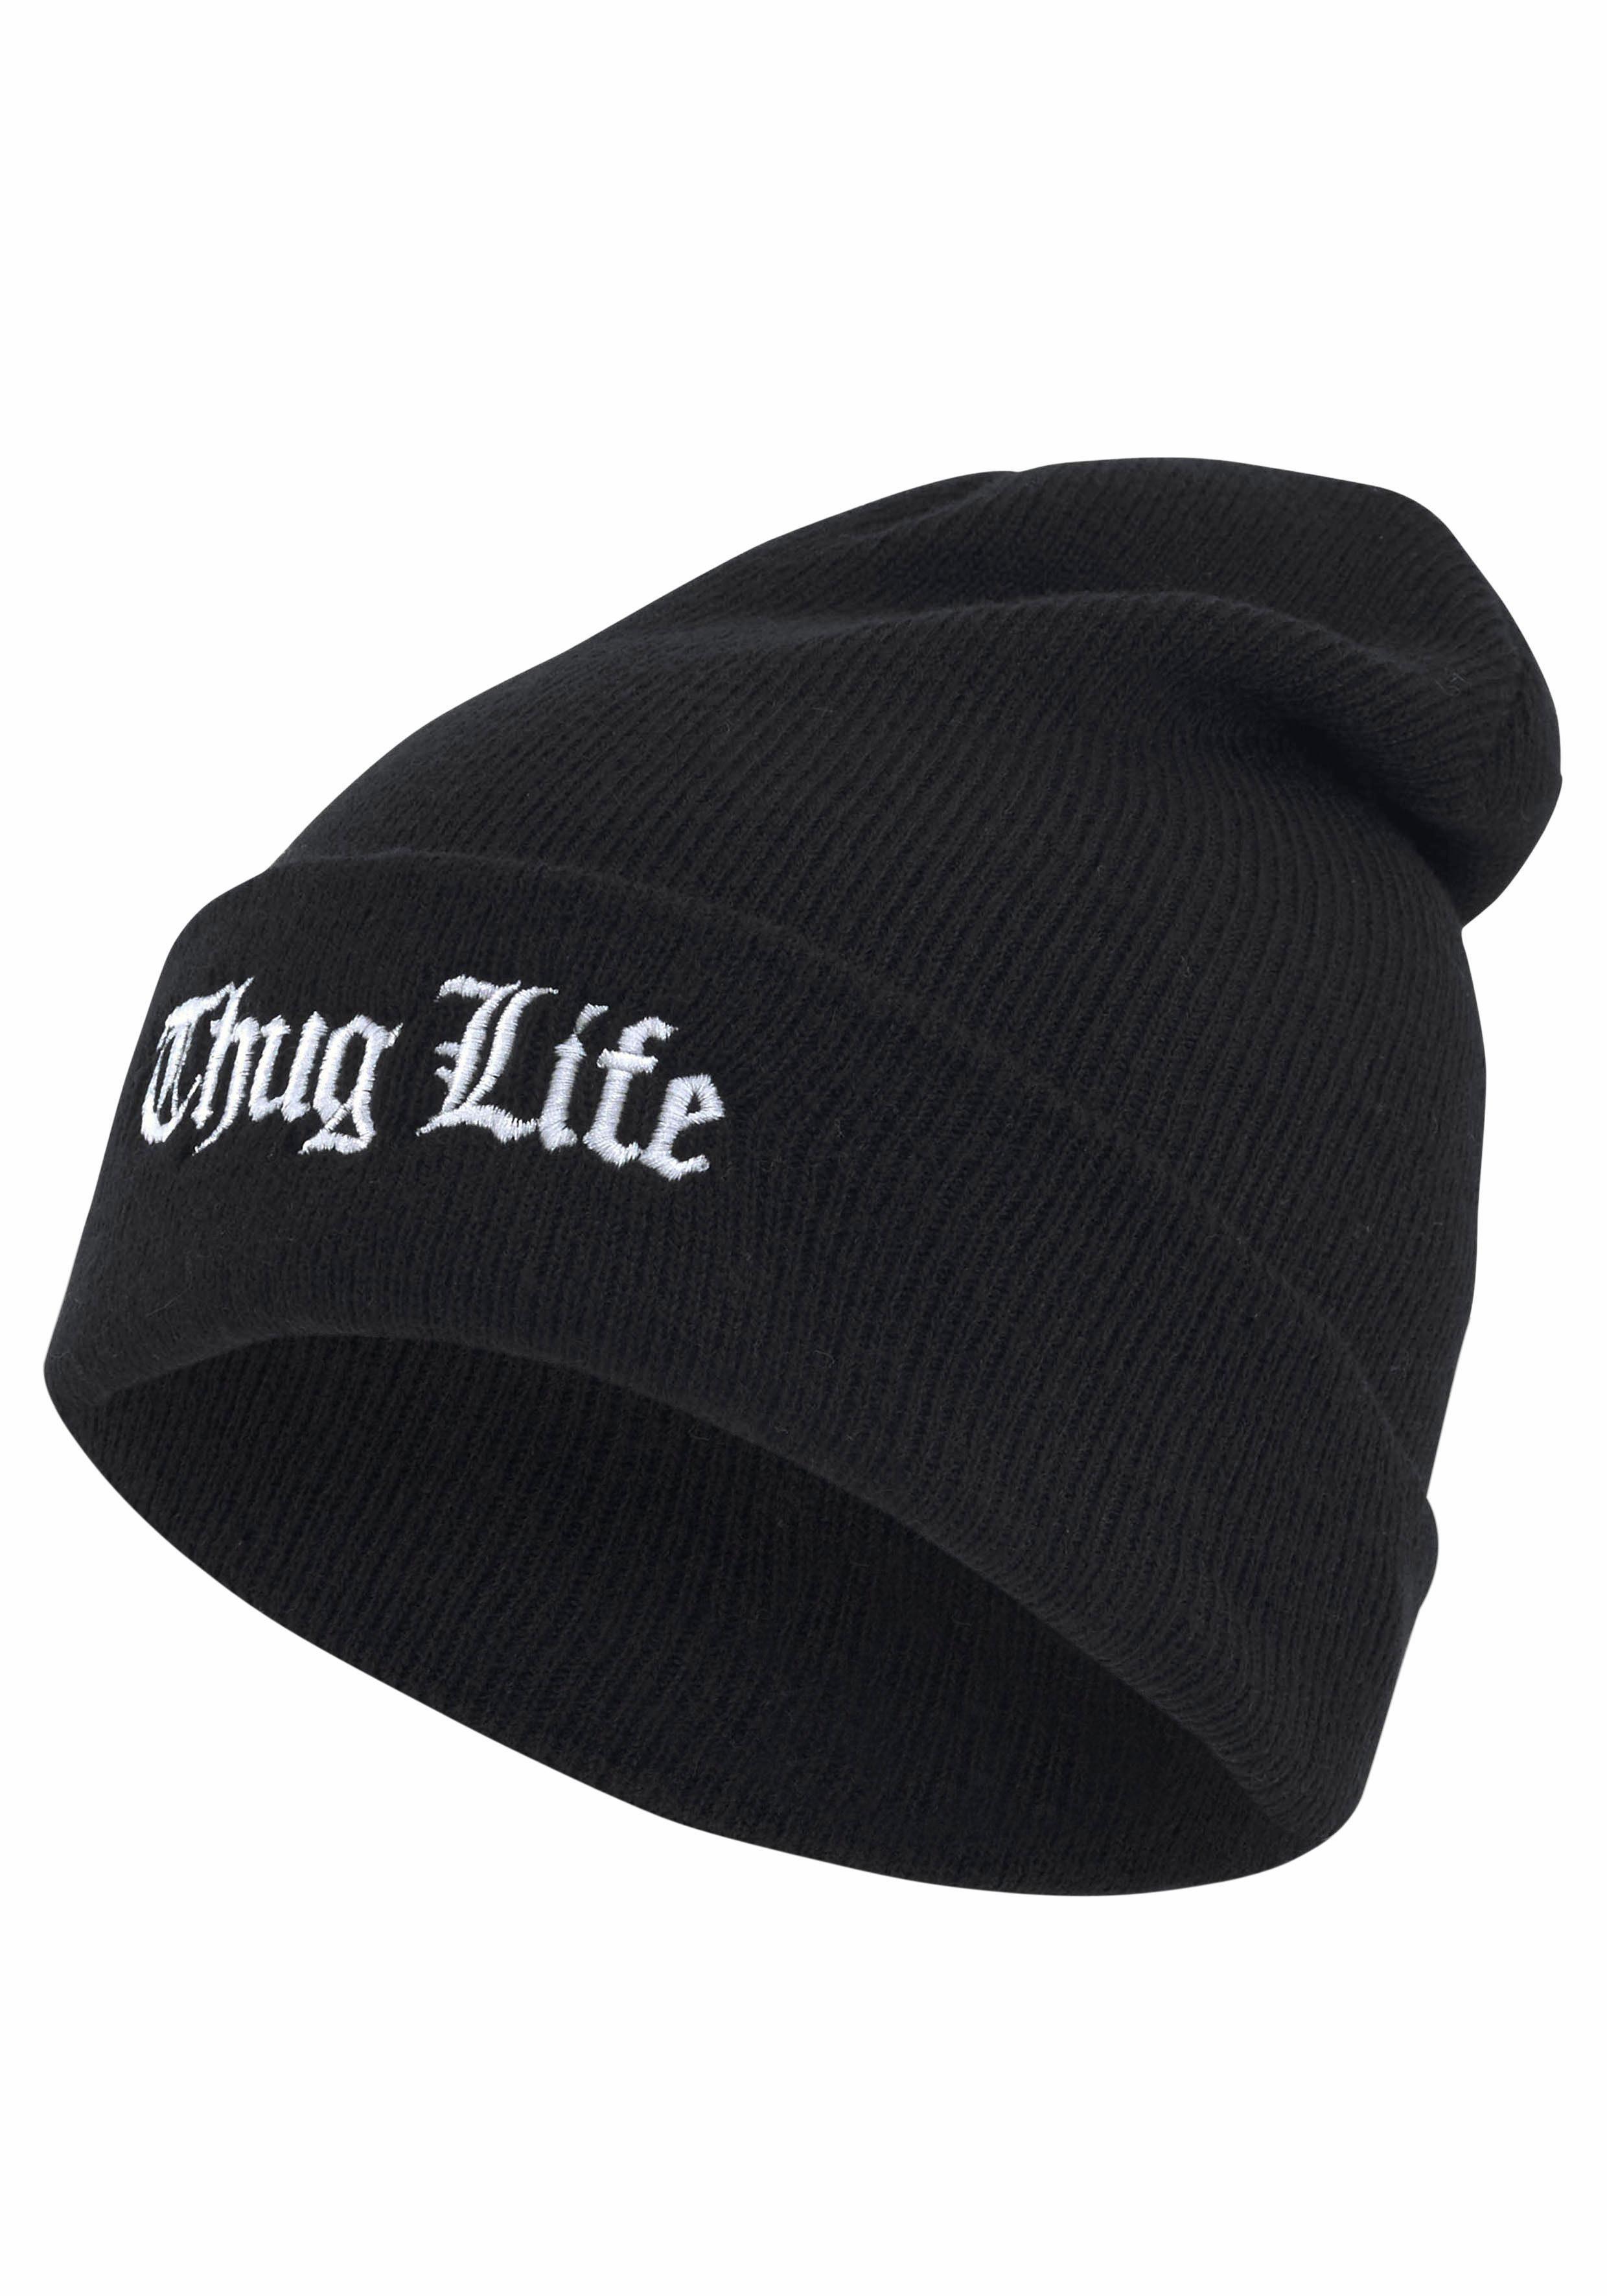 Thug Life Strickmütze Old English Beanie